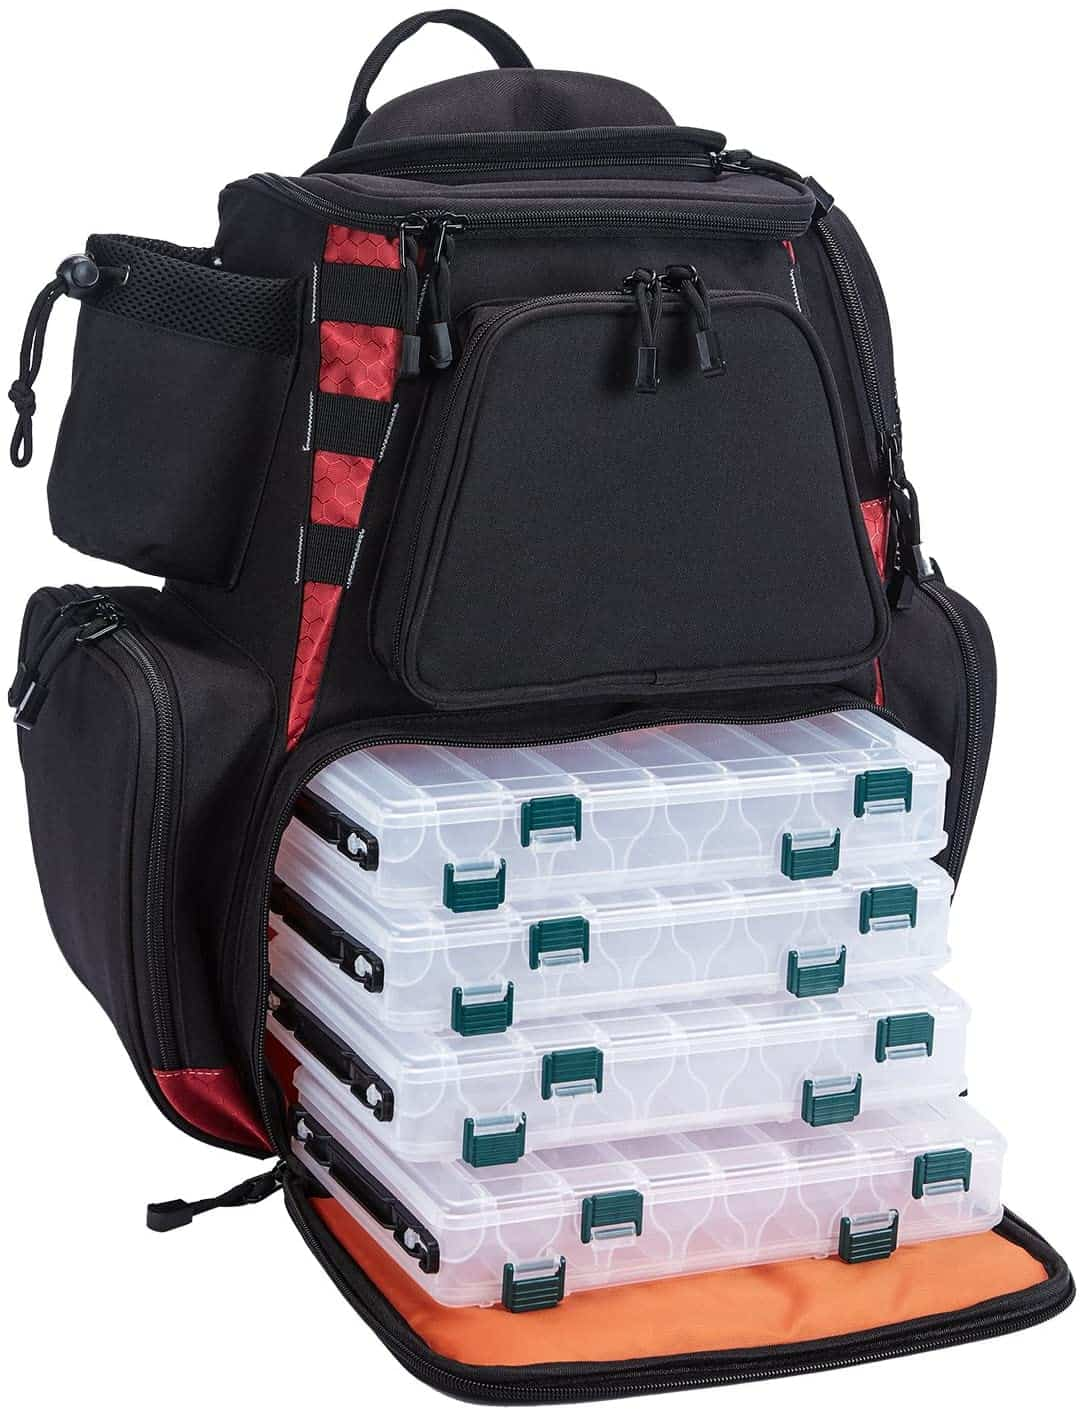 Piscifun Backpack Fishing Tackle Box